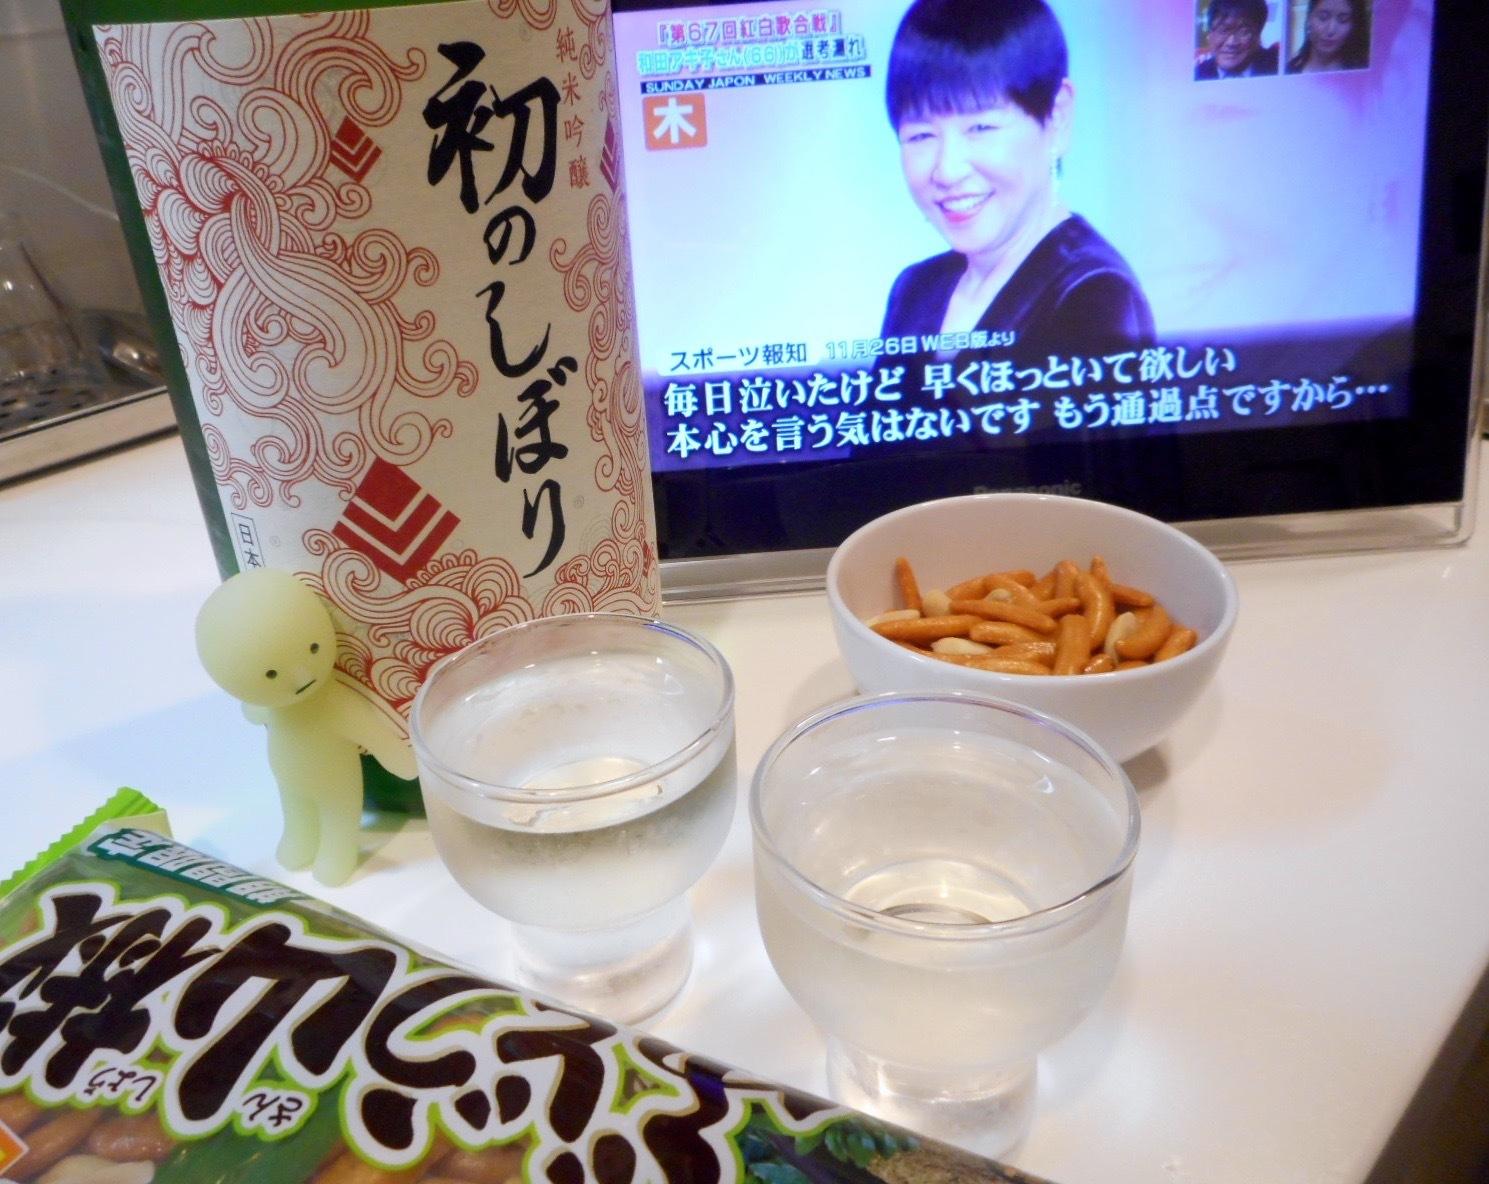 kozaemon_hatsunoshibori_jikagumi28by5.jpg